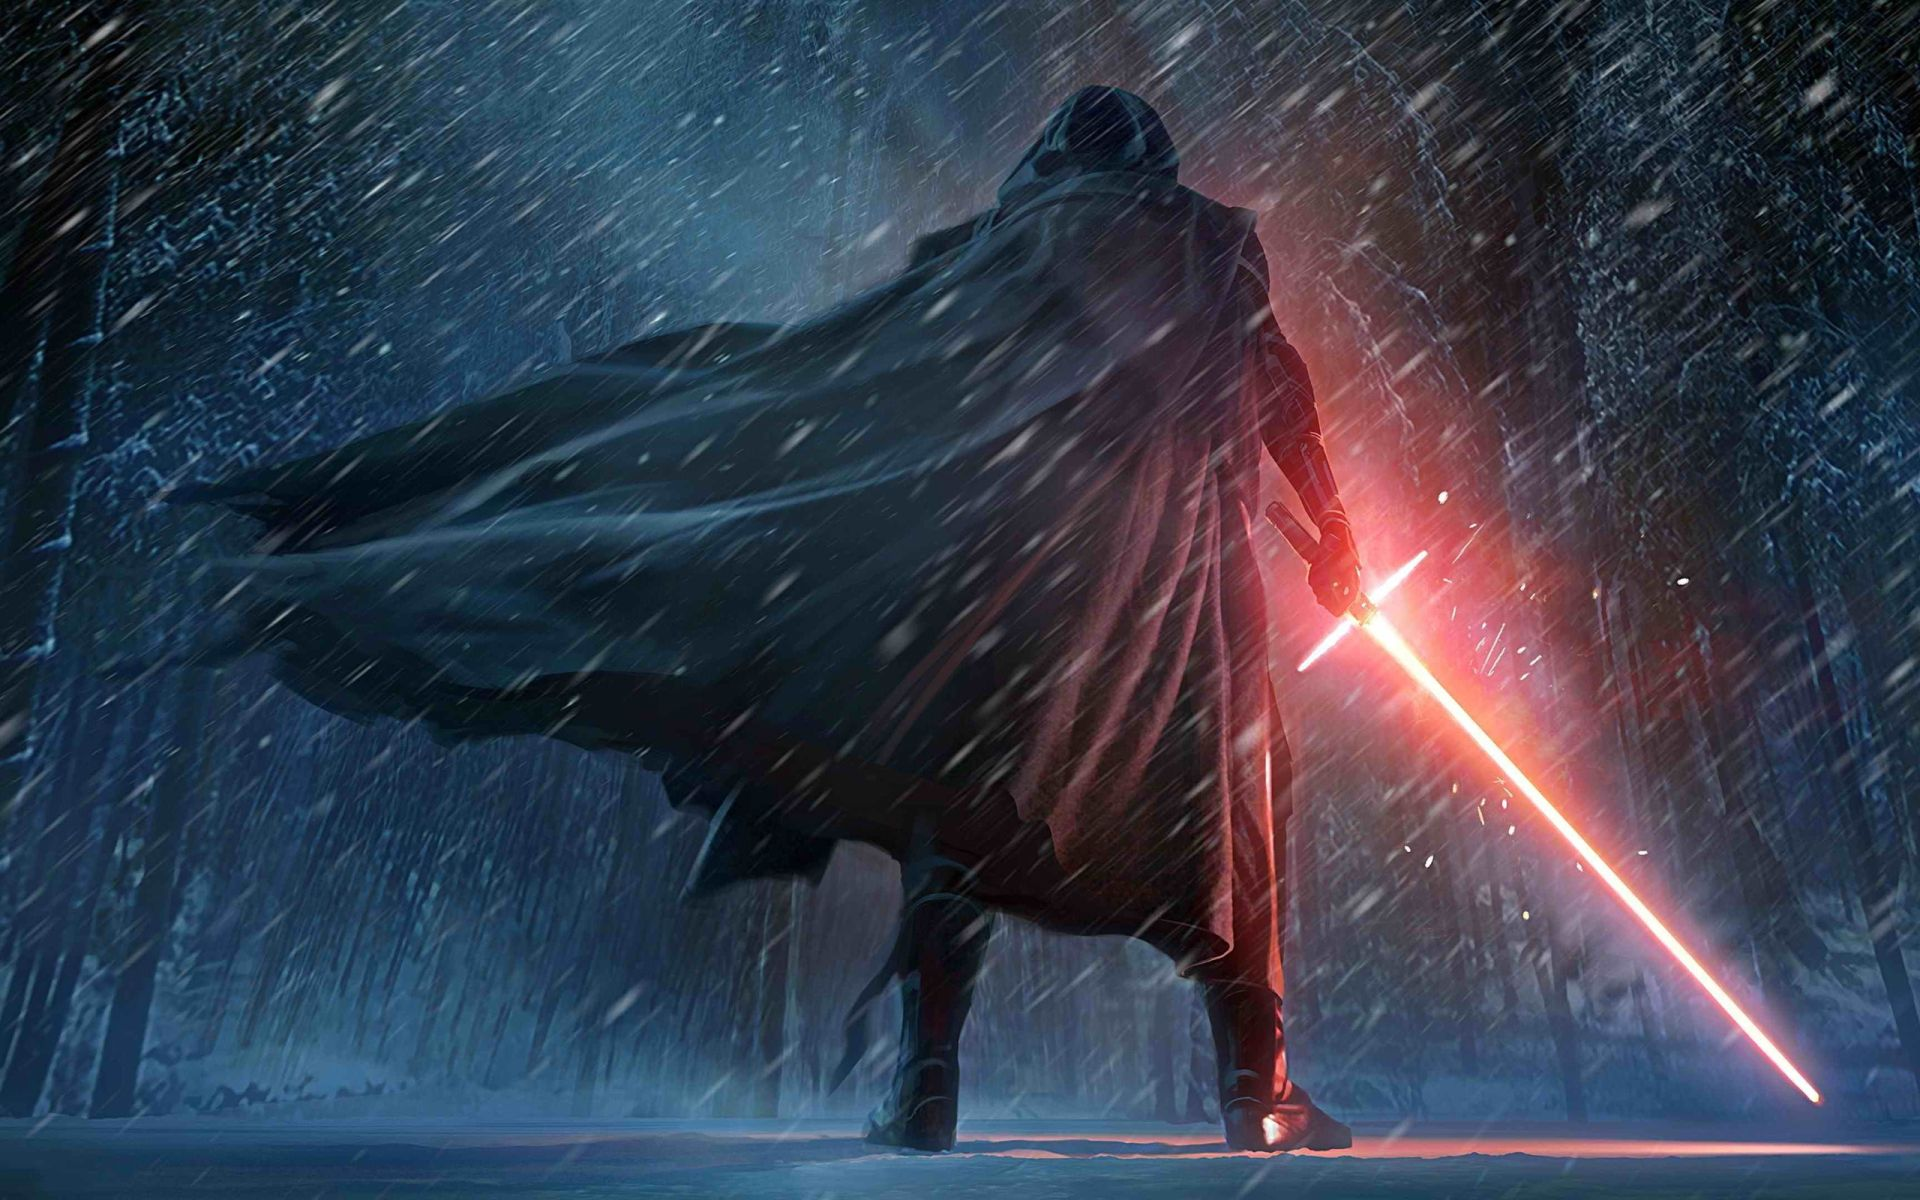 Star Wars Screensaver full wallpaper